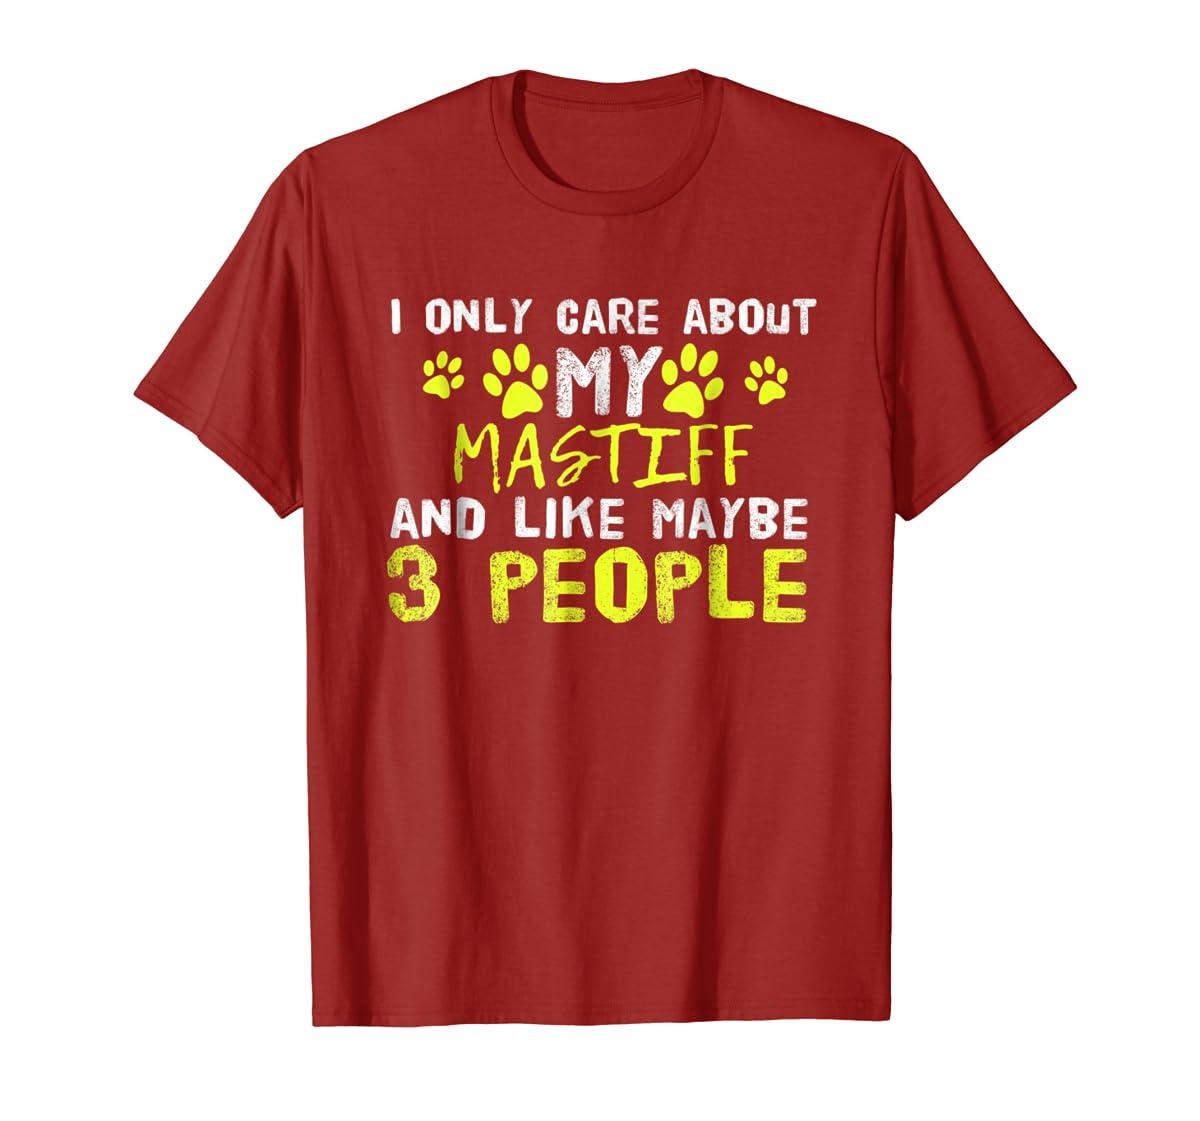 Mastiff Dog Shirt Introvert Love My Dog Tee-Men's T-Shirt-Red